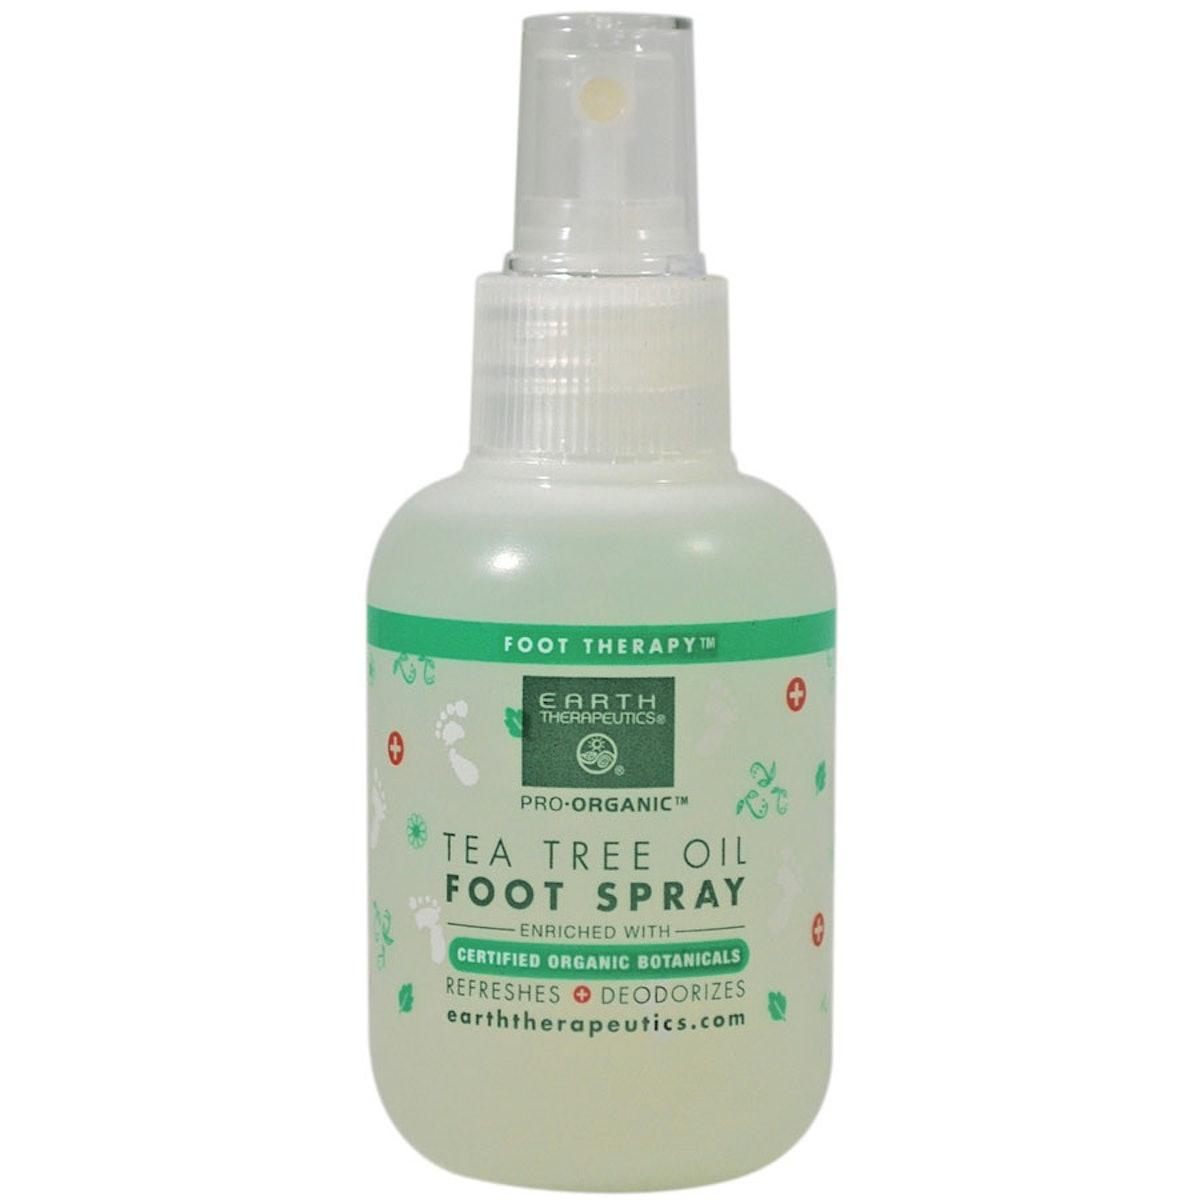 Earth Therapeutics Foot Spray